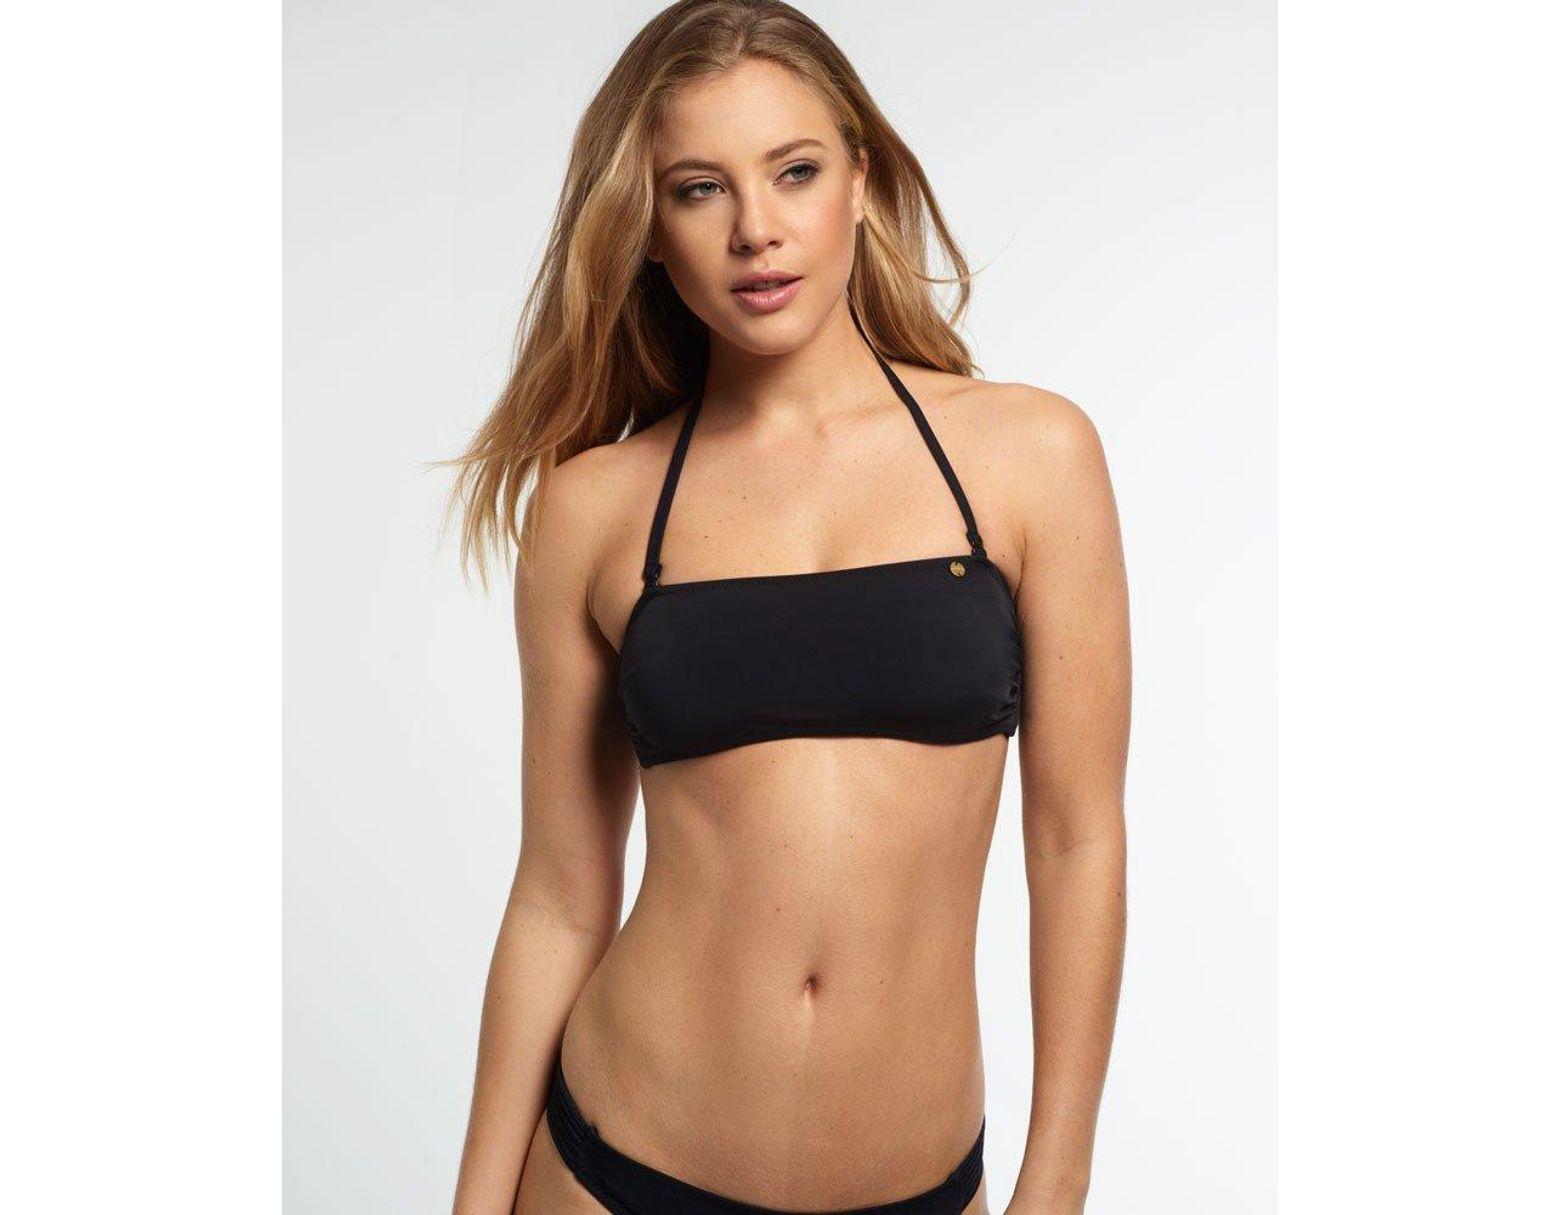 1f64efee9423f Superdry Santorini Bandeau Bikini Top in Black - Save 29% - Lyst